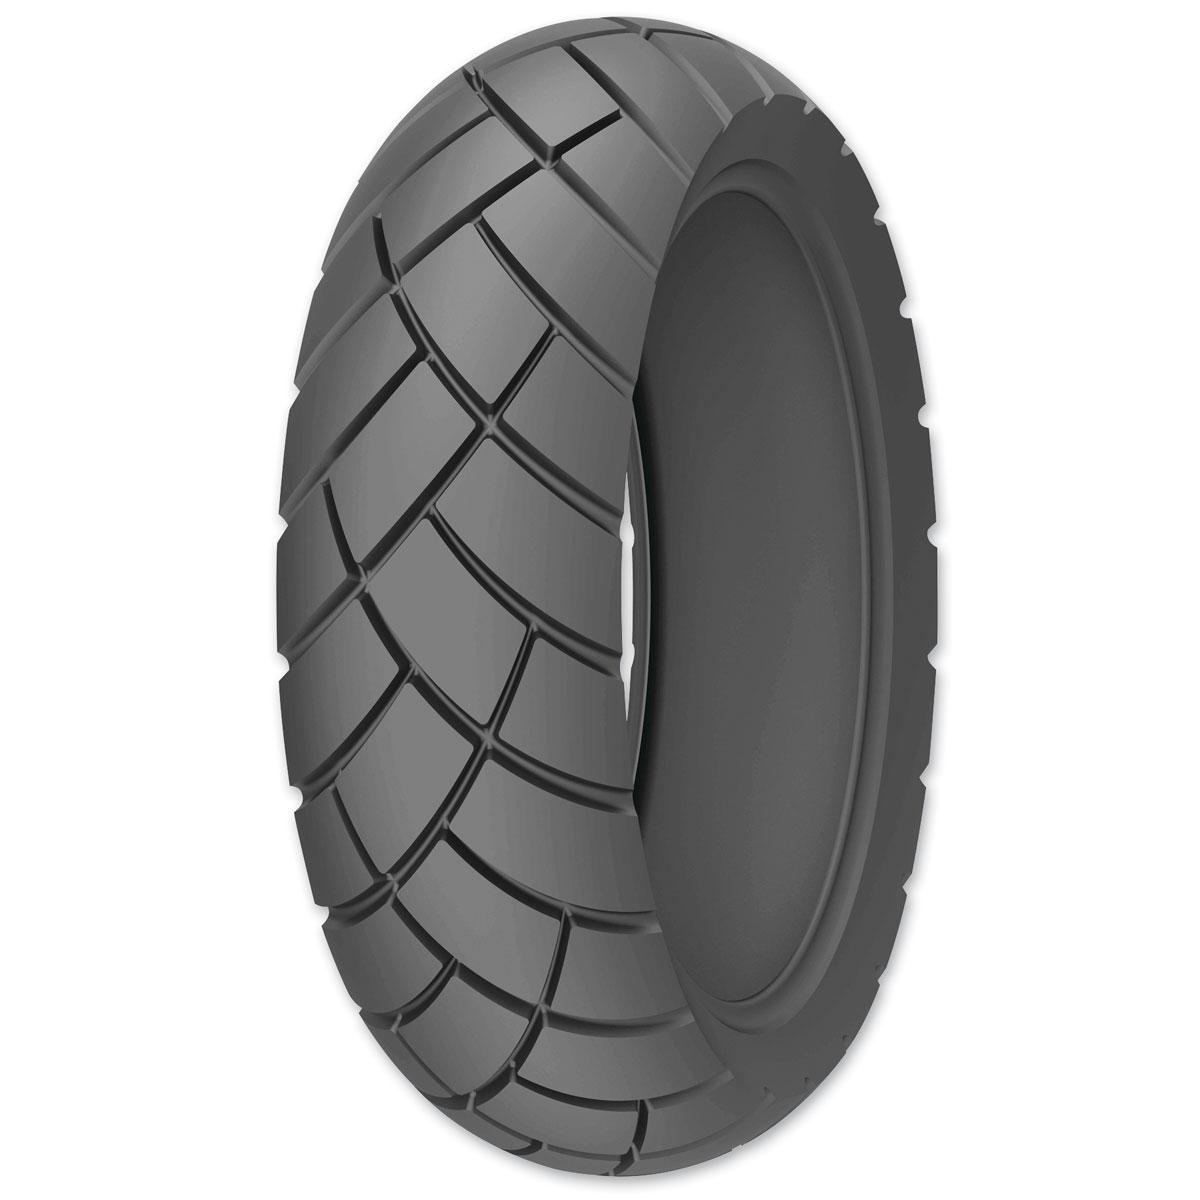 Kenda Tires K678 Paver 110/80B19 Front Tire   160-1597   J&P Cycles